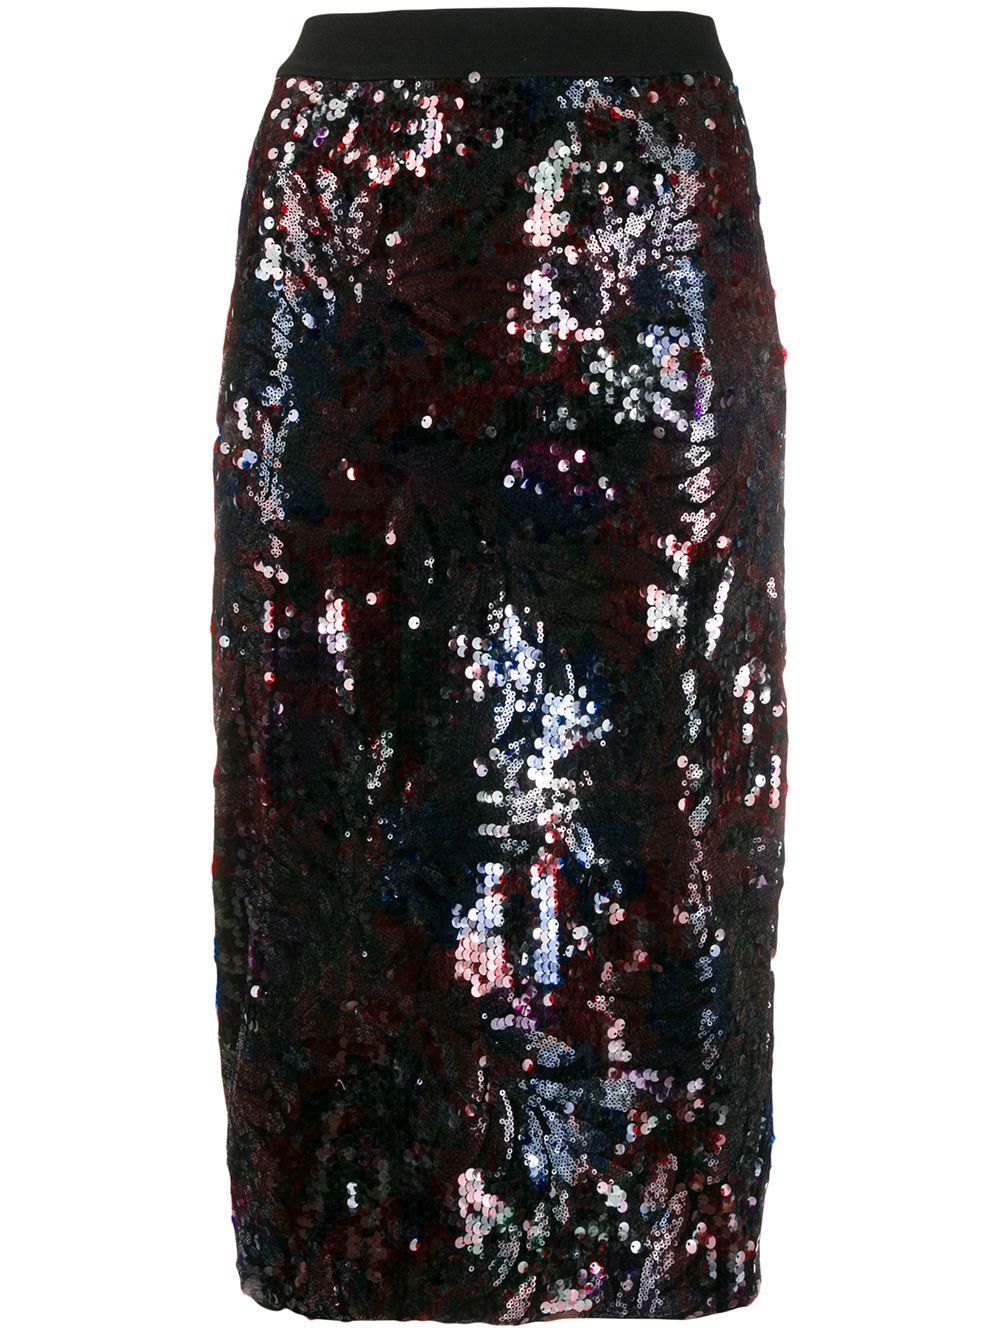 Essentiel Antwerp юбка-карандаш Tempta с пайетками